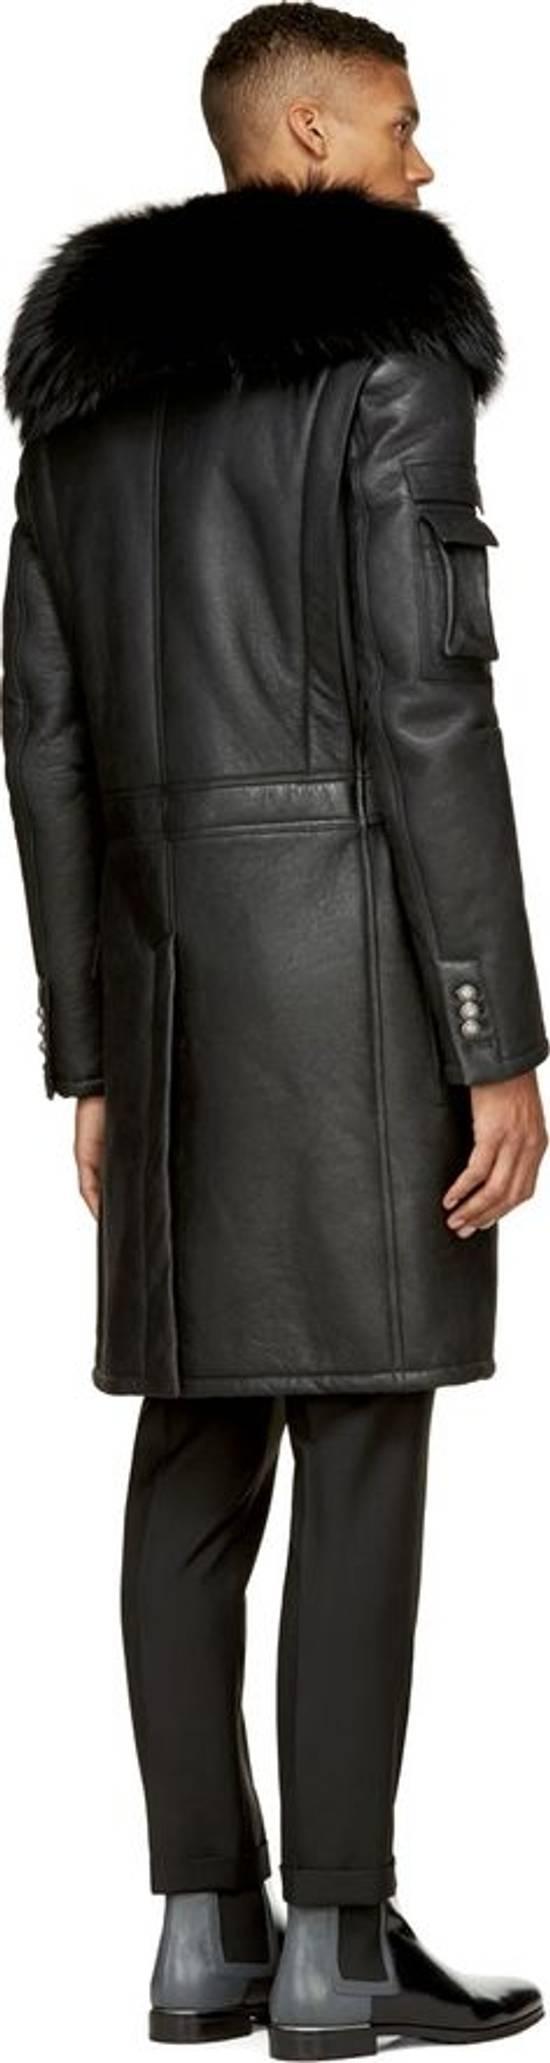 Balmain Balmain Leather Shearling Fur Parka Black Size Small 46-48 Coat Military Size US S / EU 44-46 / 1 - 3